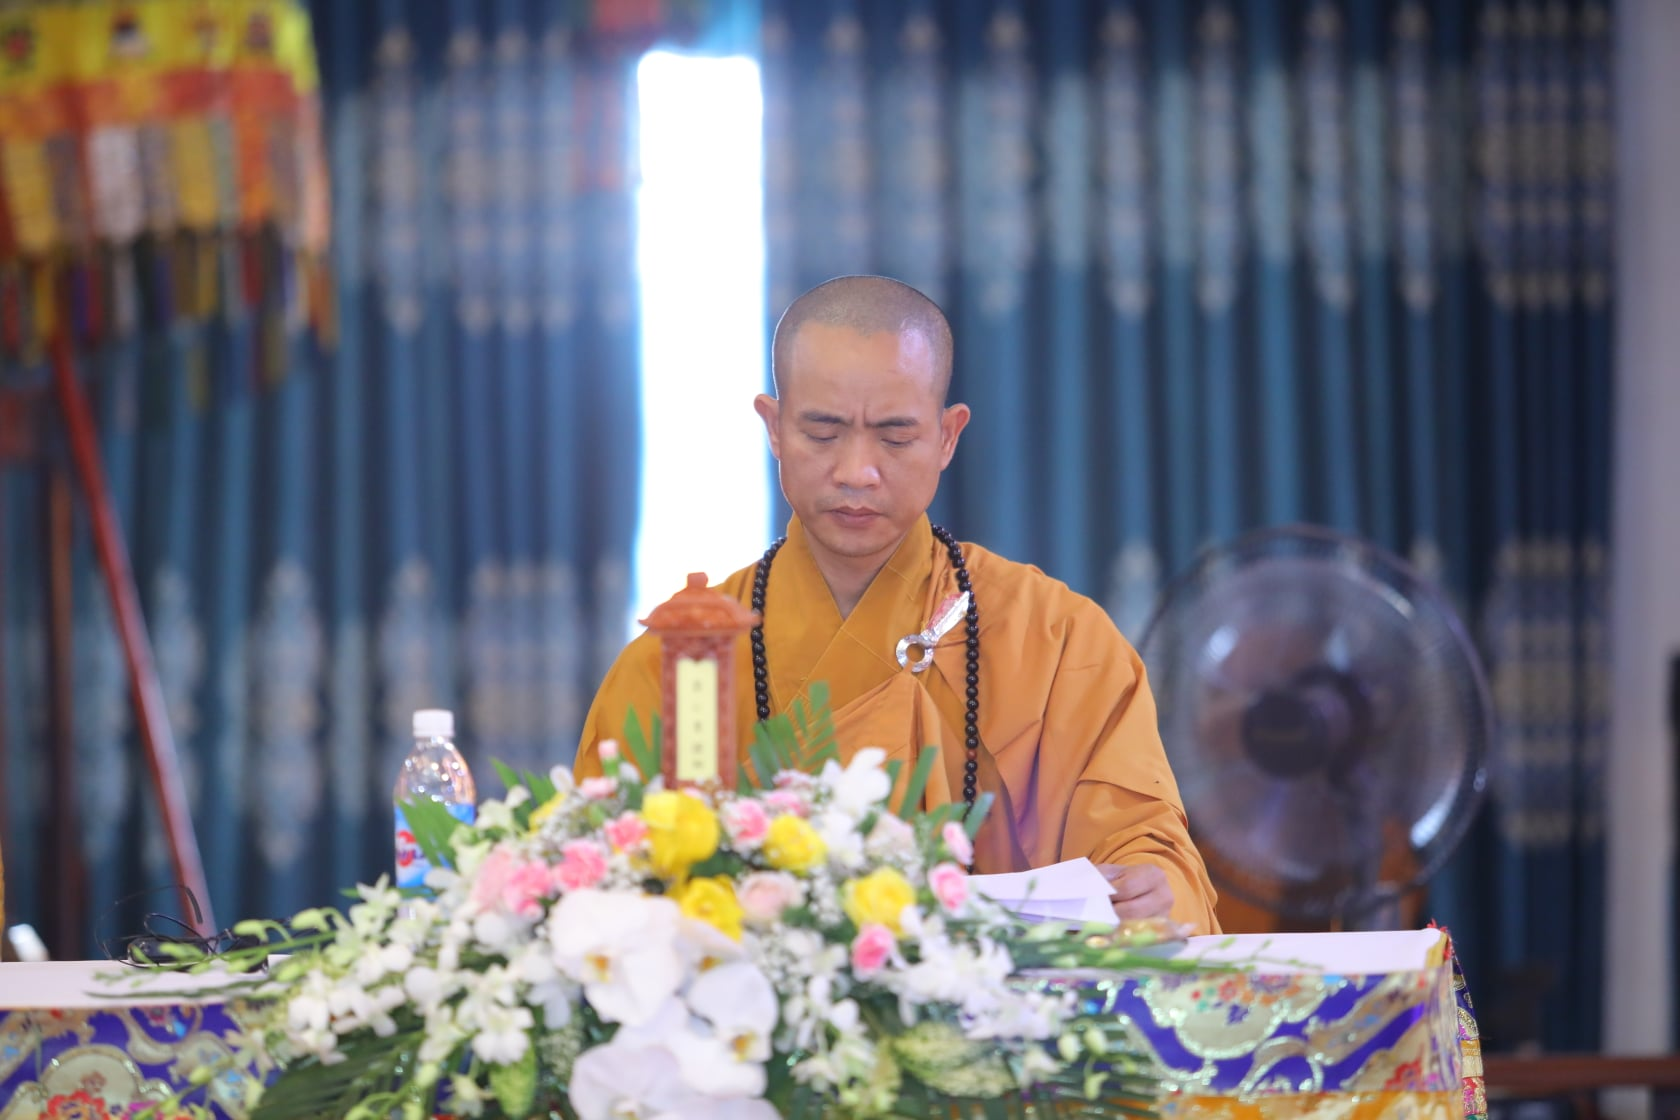 Thang Nghiem Dai Gioi Dan IV (117)